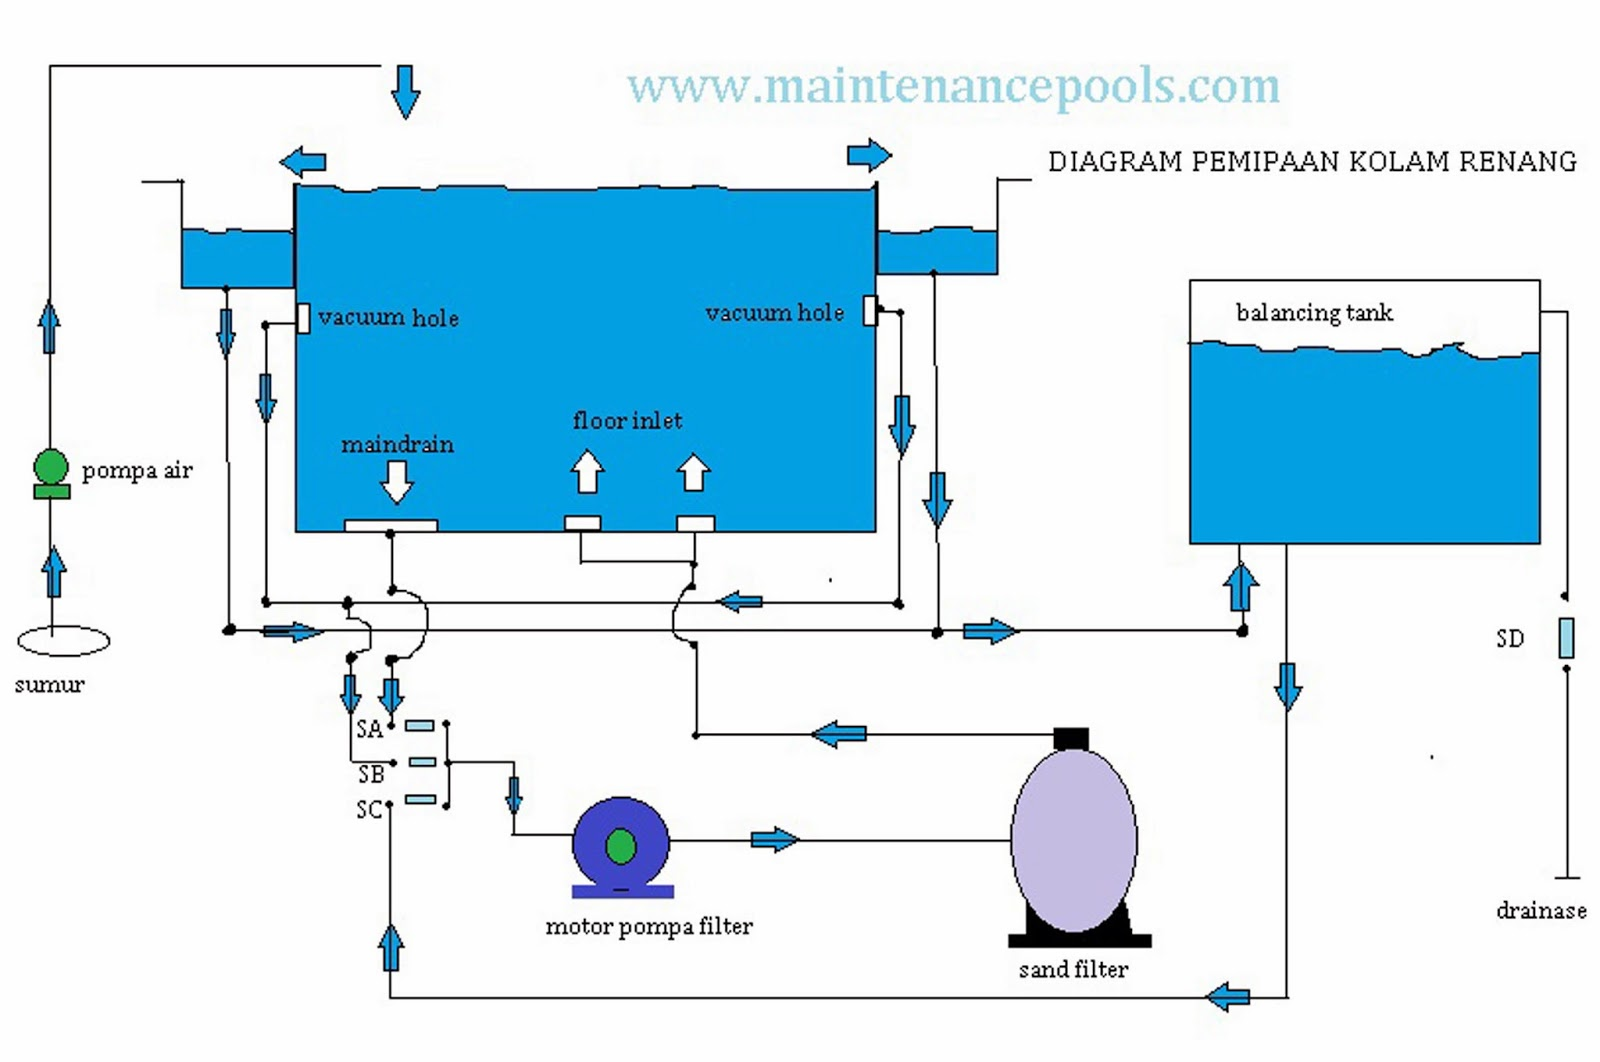 Hayward Motor Wiring Diagram Great Engine Schematic Electric 2 Sd Pool Pump Super Century Single Phase Diagrams